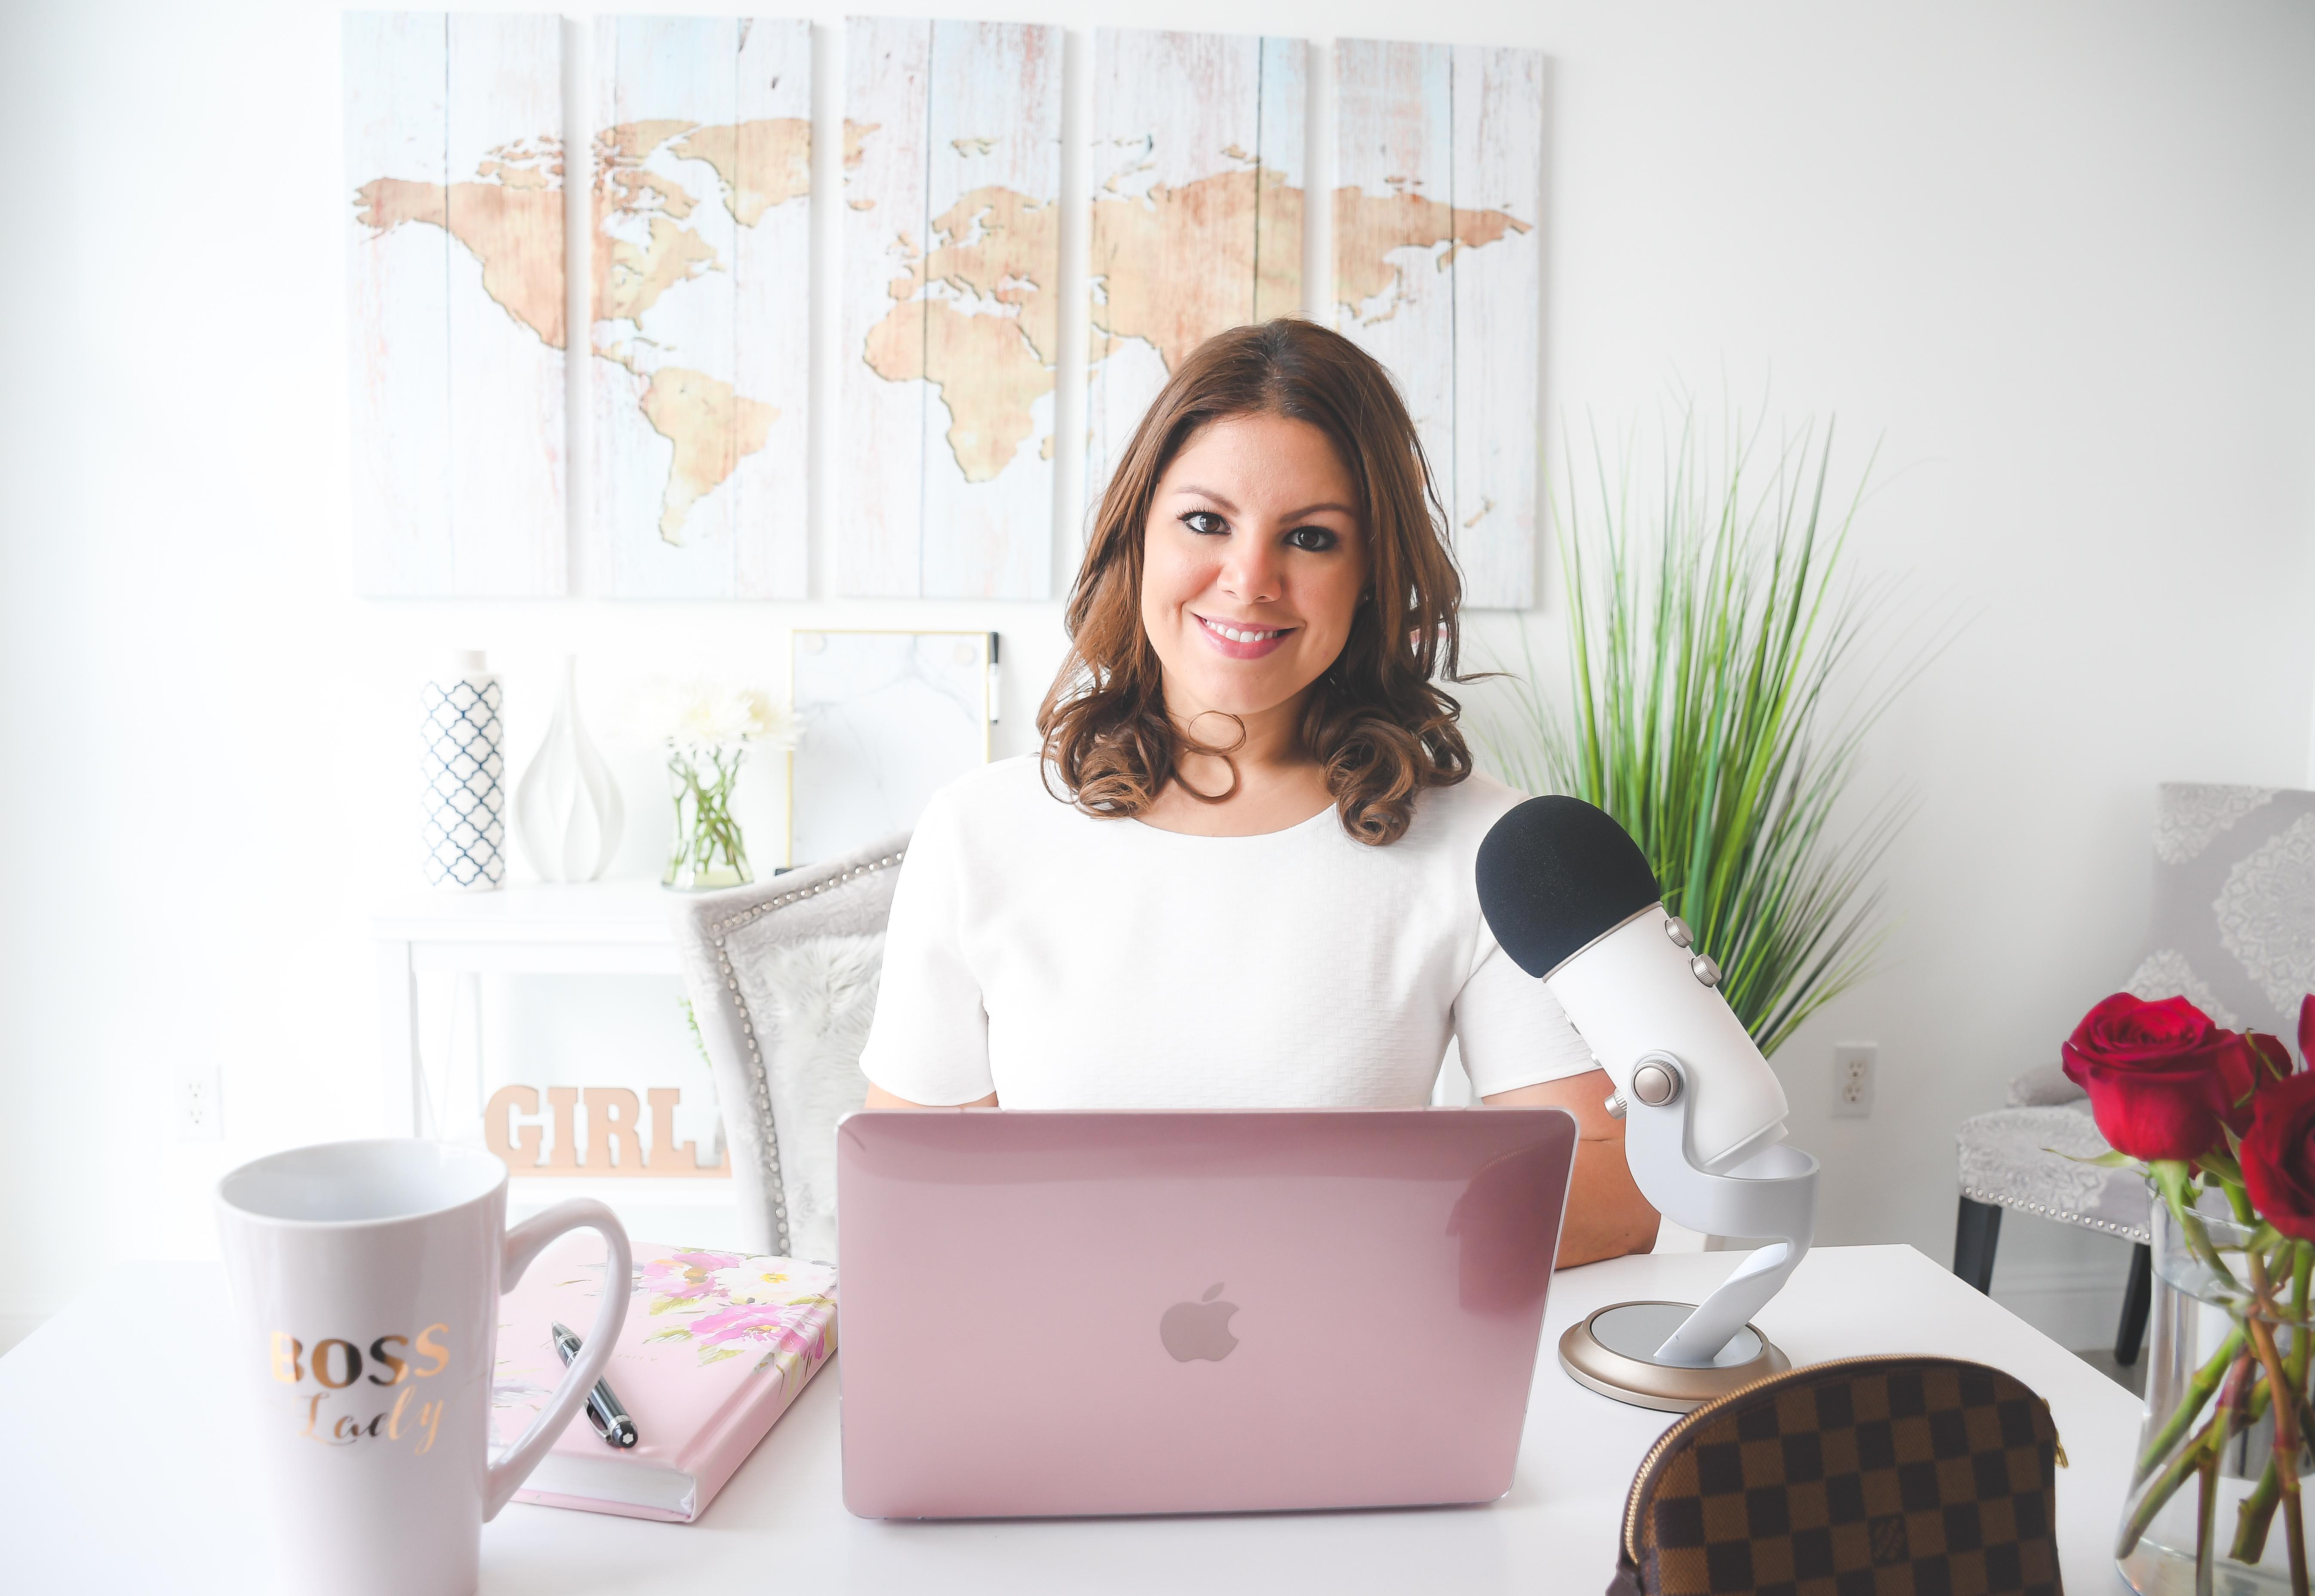 Ilean Harris- founder of the Digital Asset Incubator